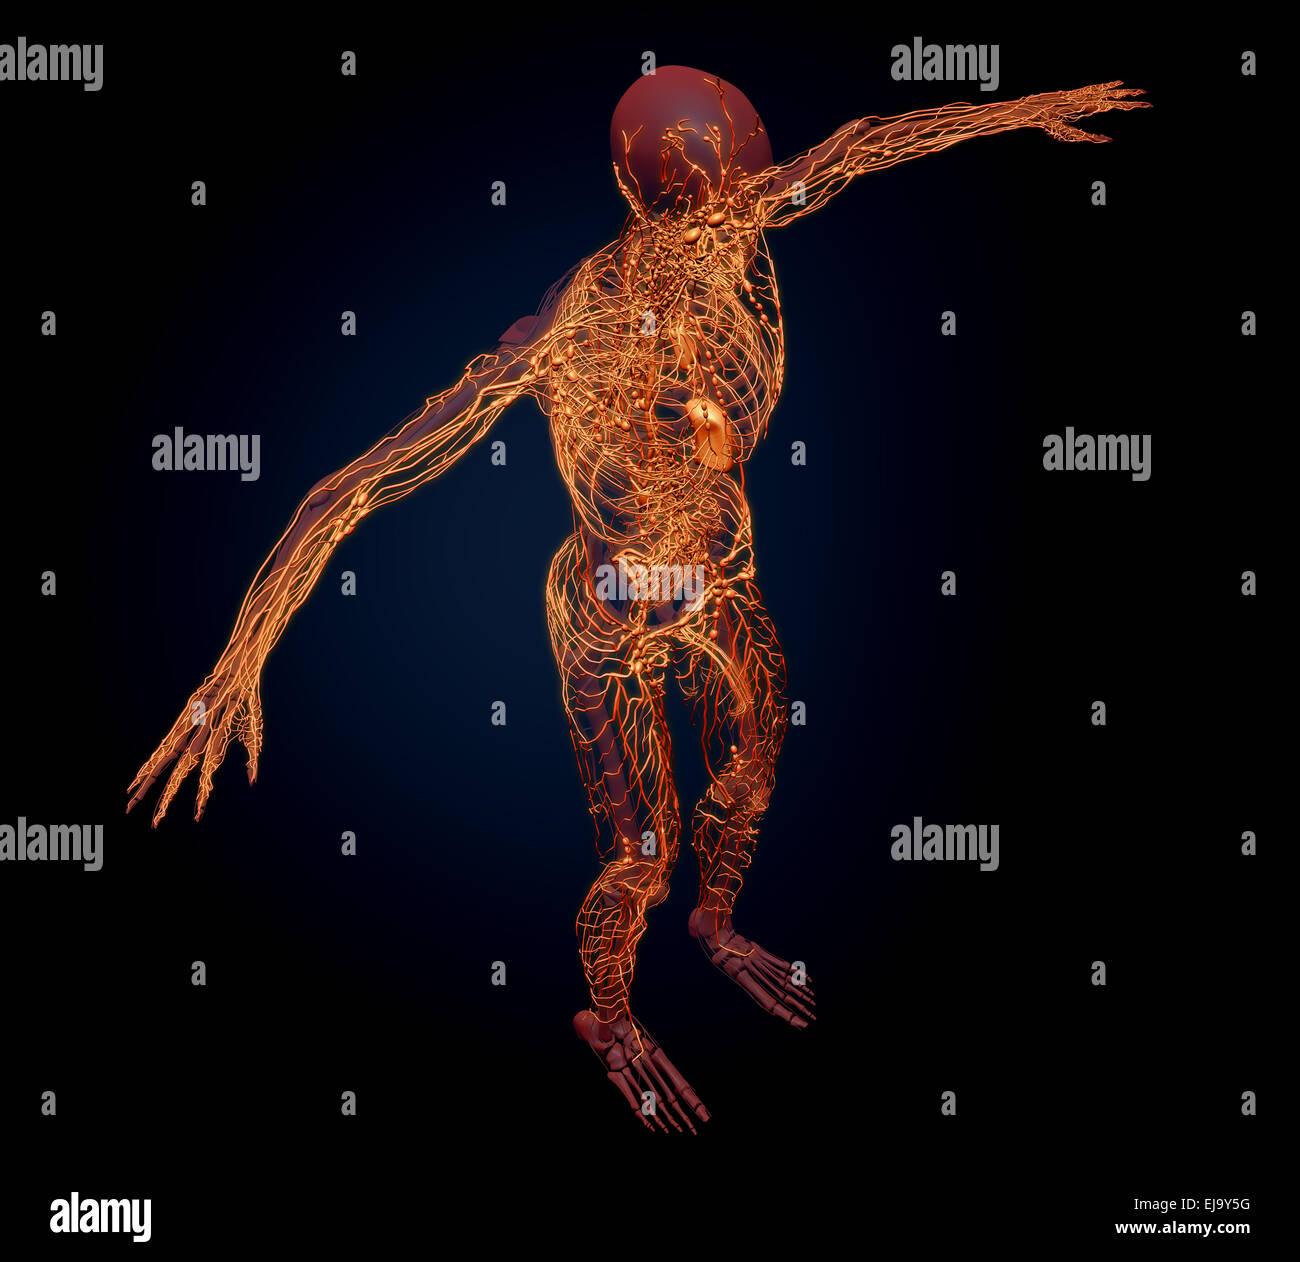 Human lymphatic system - medical illustration - Stock Image